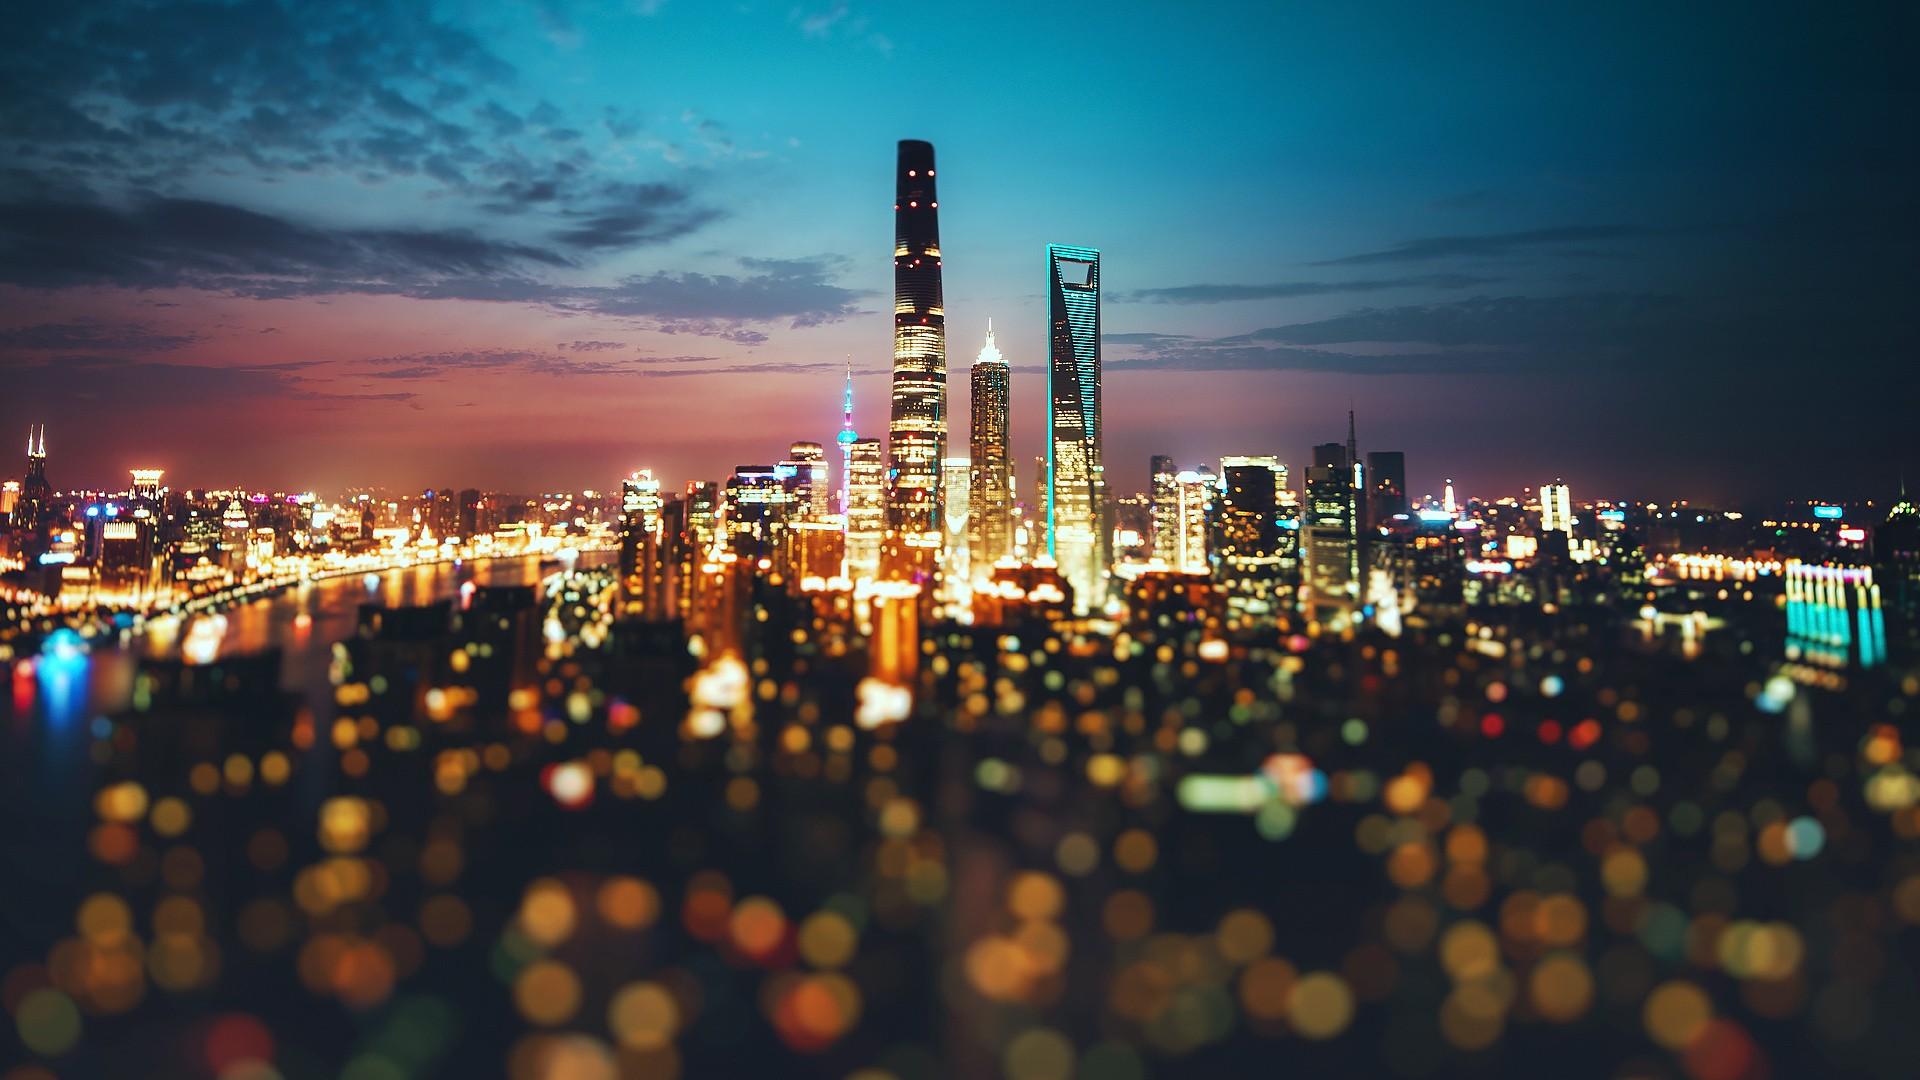 Wallpaper For Girls Laptop Desktop Wallpaper Shanghai City Night Lights Bokeh Hd